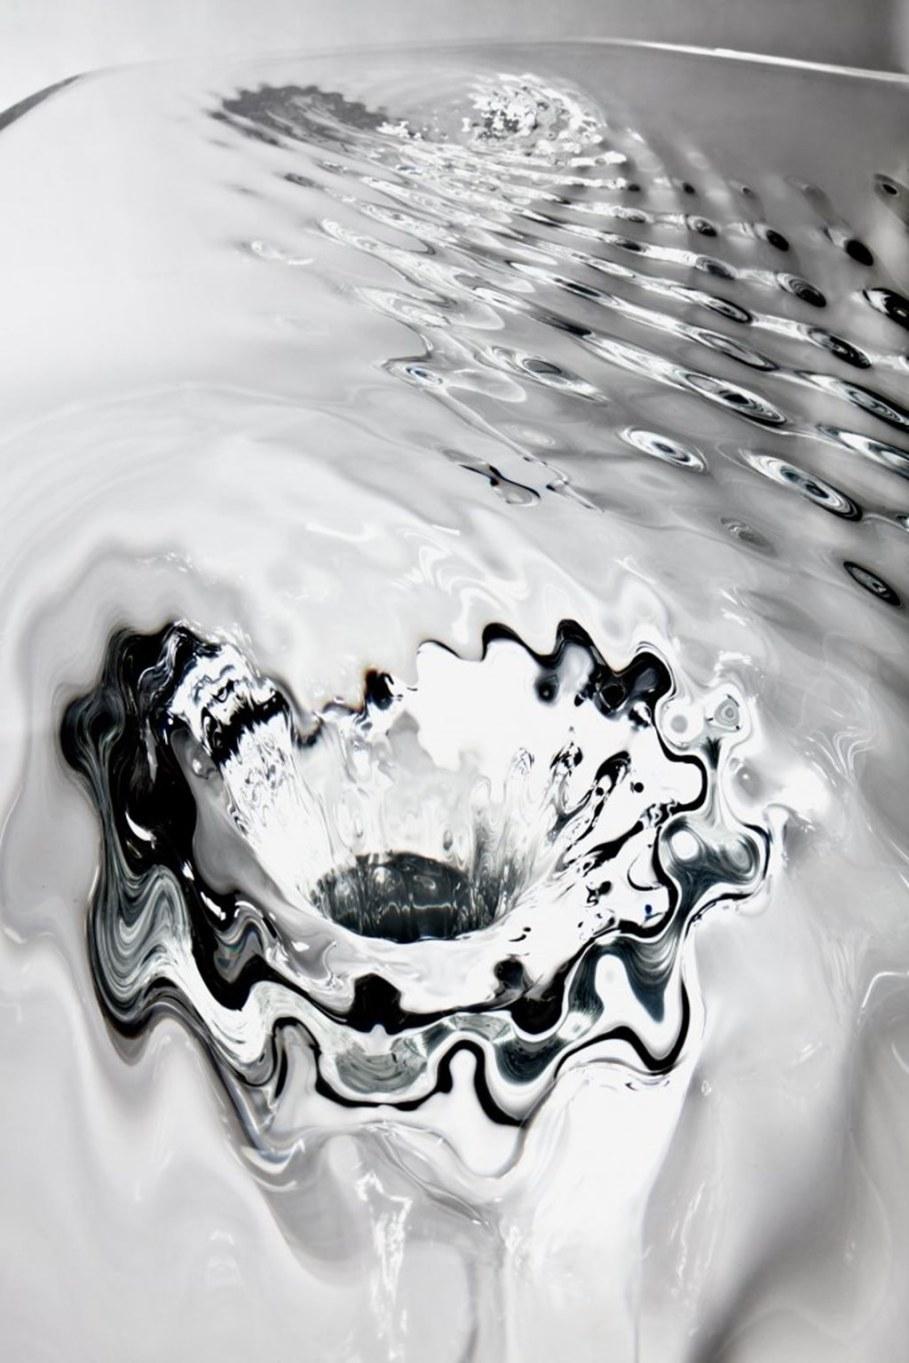 Liquid Glacial Table 3